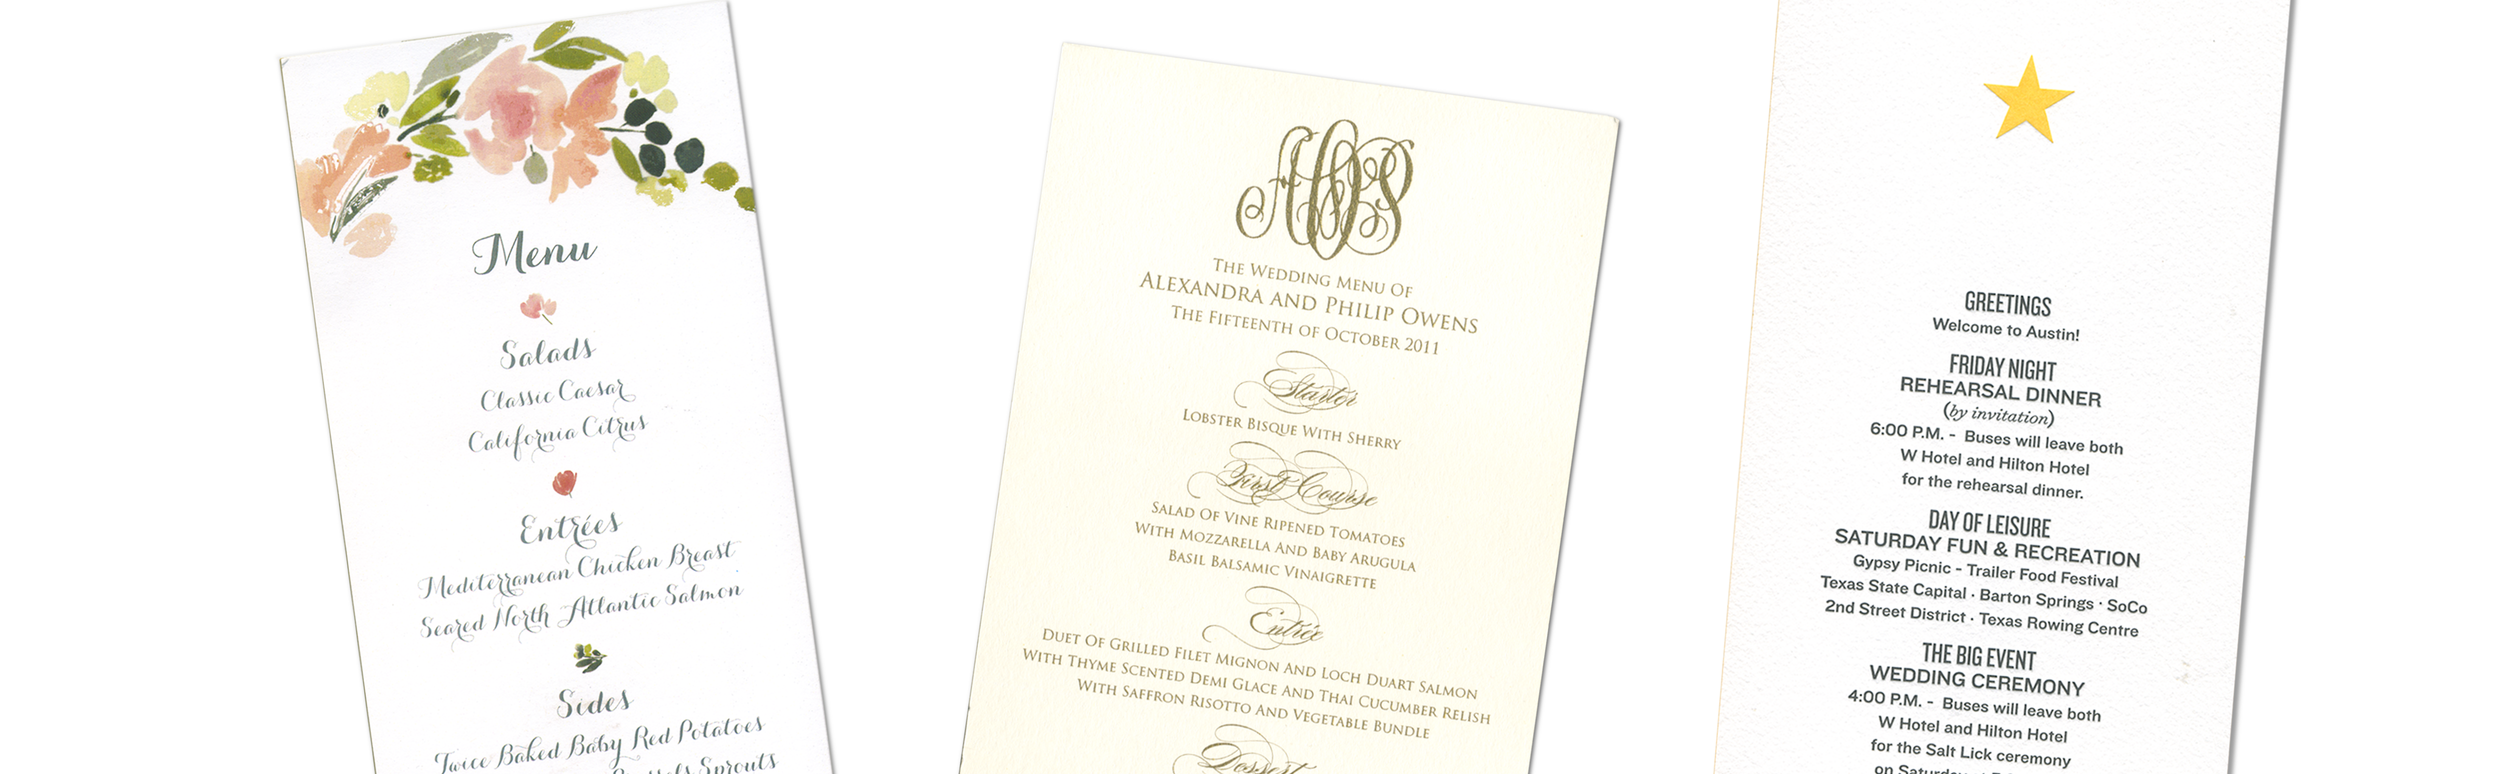 menu-slider-2.png